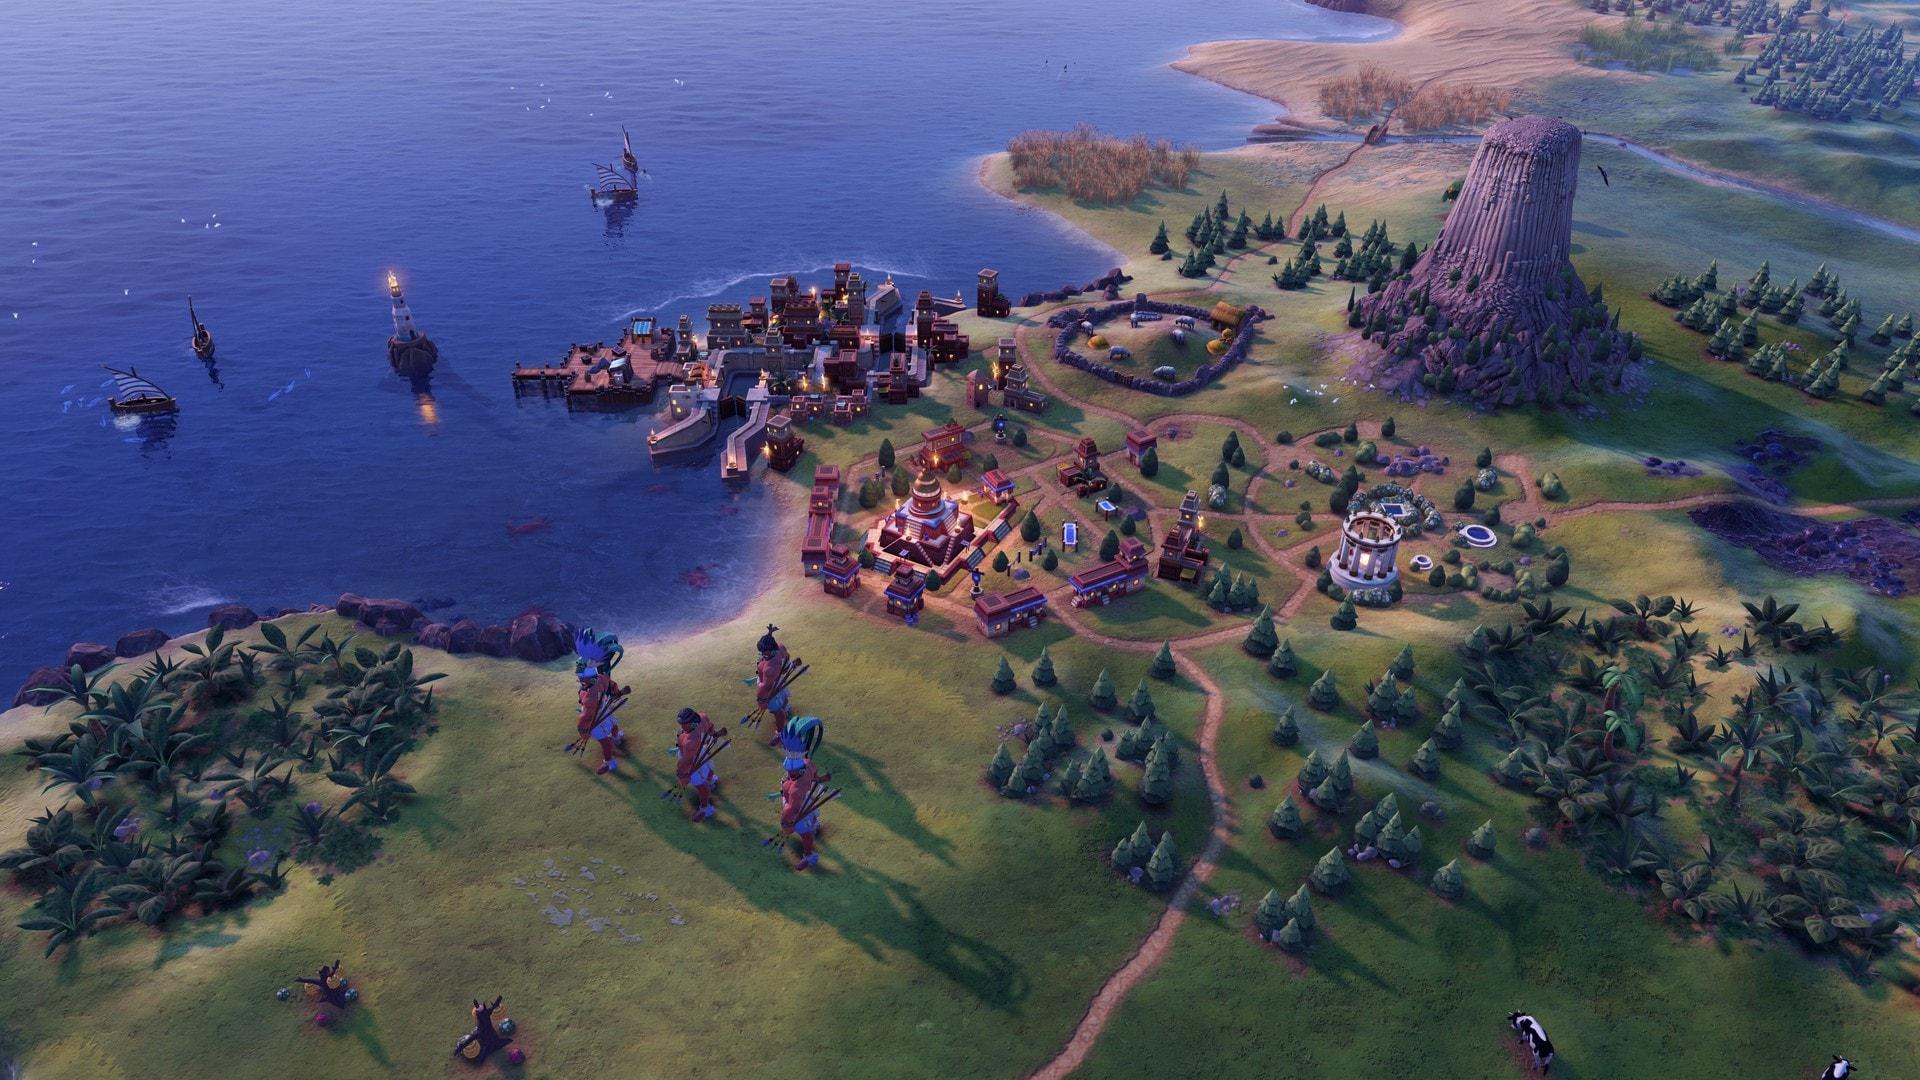 Sid Meier's Civilization VI - New Frontier Pass (PC) - Steam Key - GLOBAL - 2